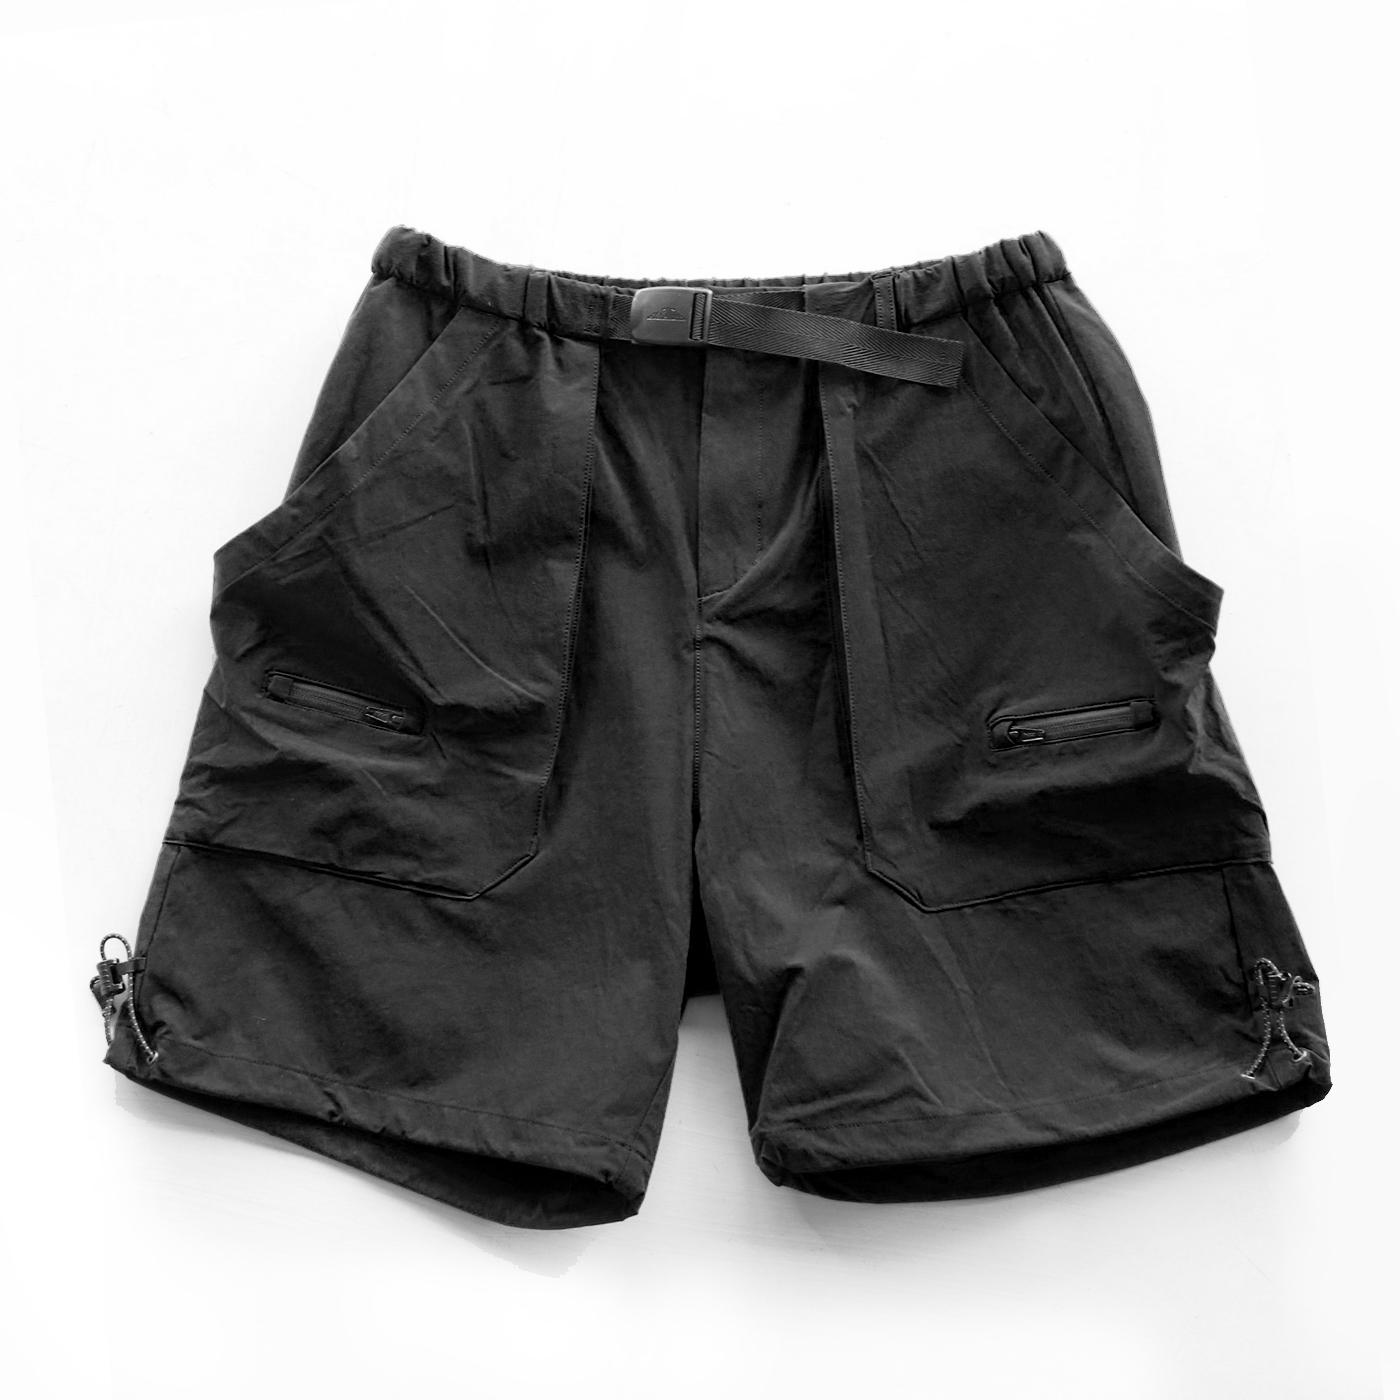 product: MS ストレッチショーツ / color: BLACK 1